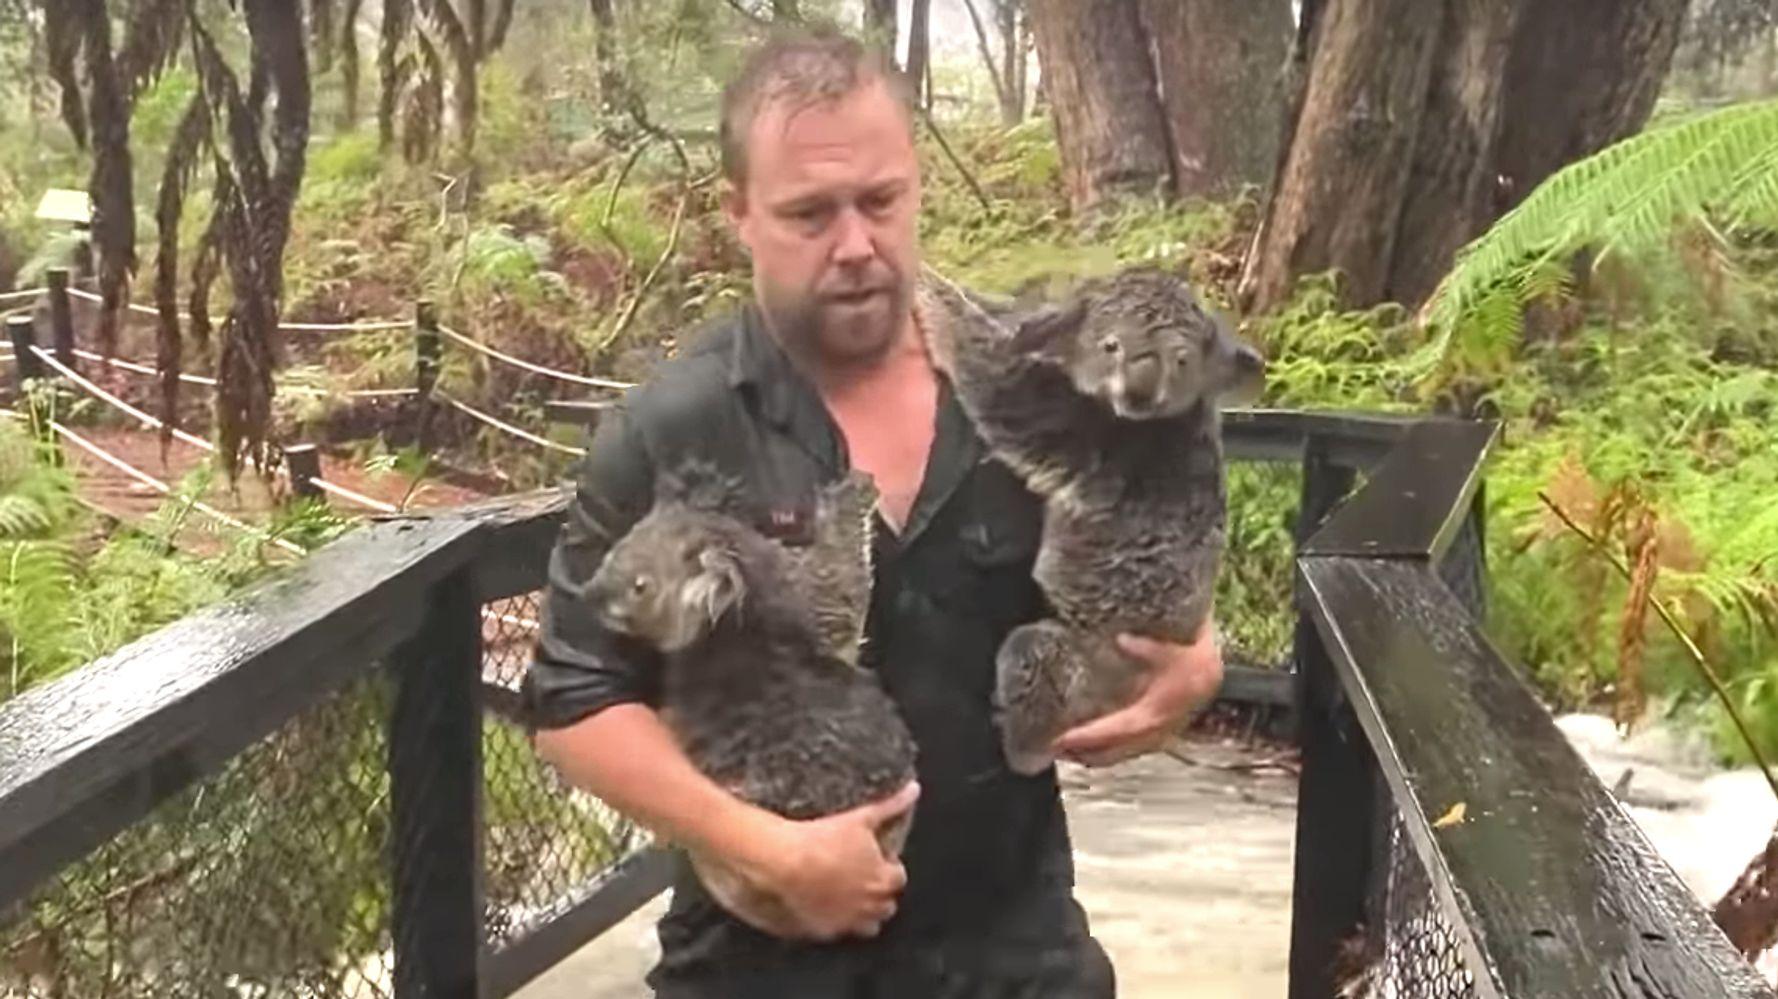 Westlake Legal Group 5e22fddc2200003200473086 Australian Zoo Staff Save Koalas, Beat Back Alligators In Dramatic Flash Floods Video